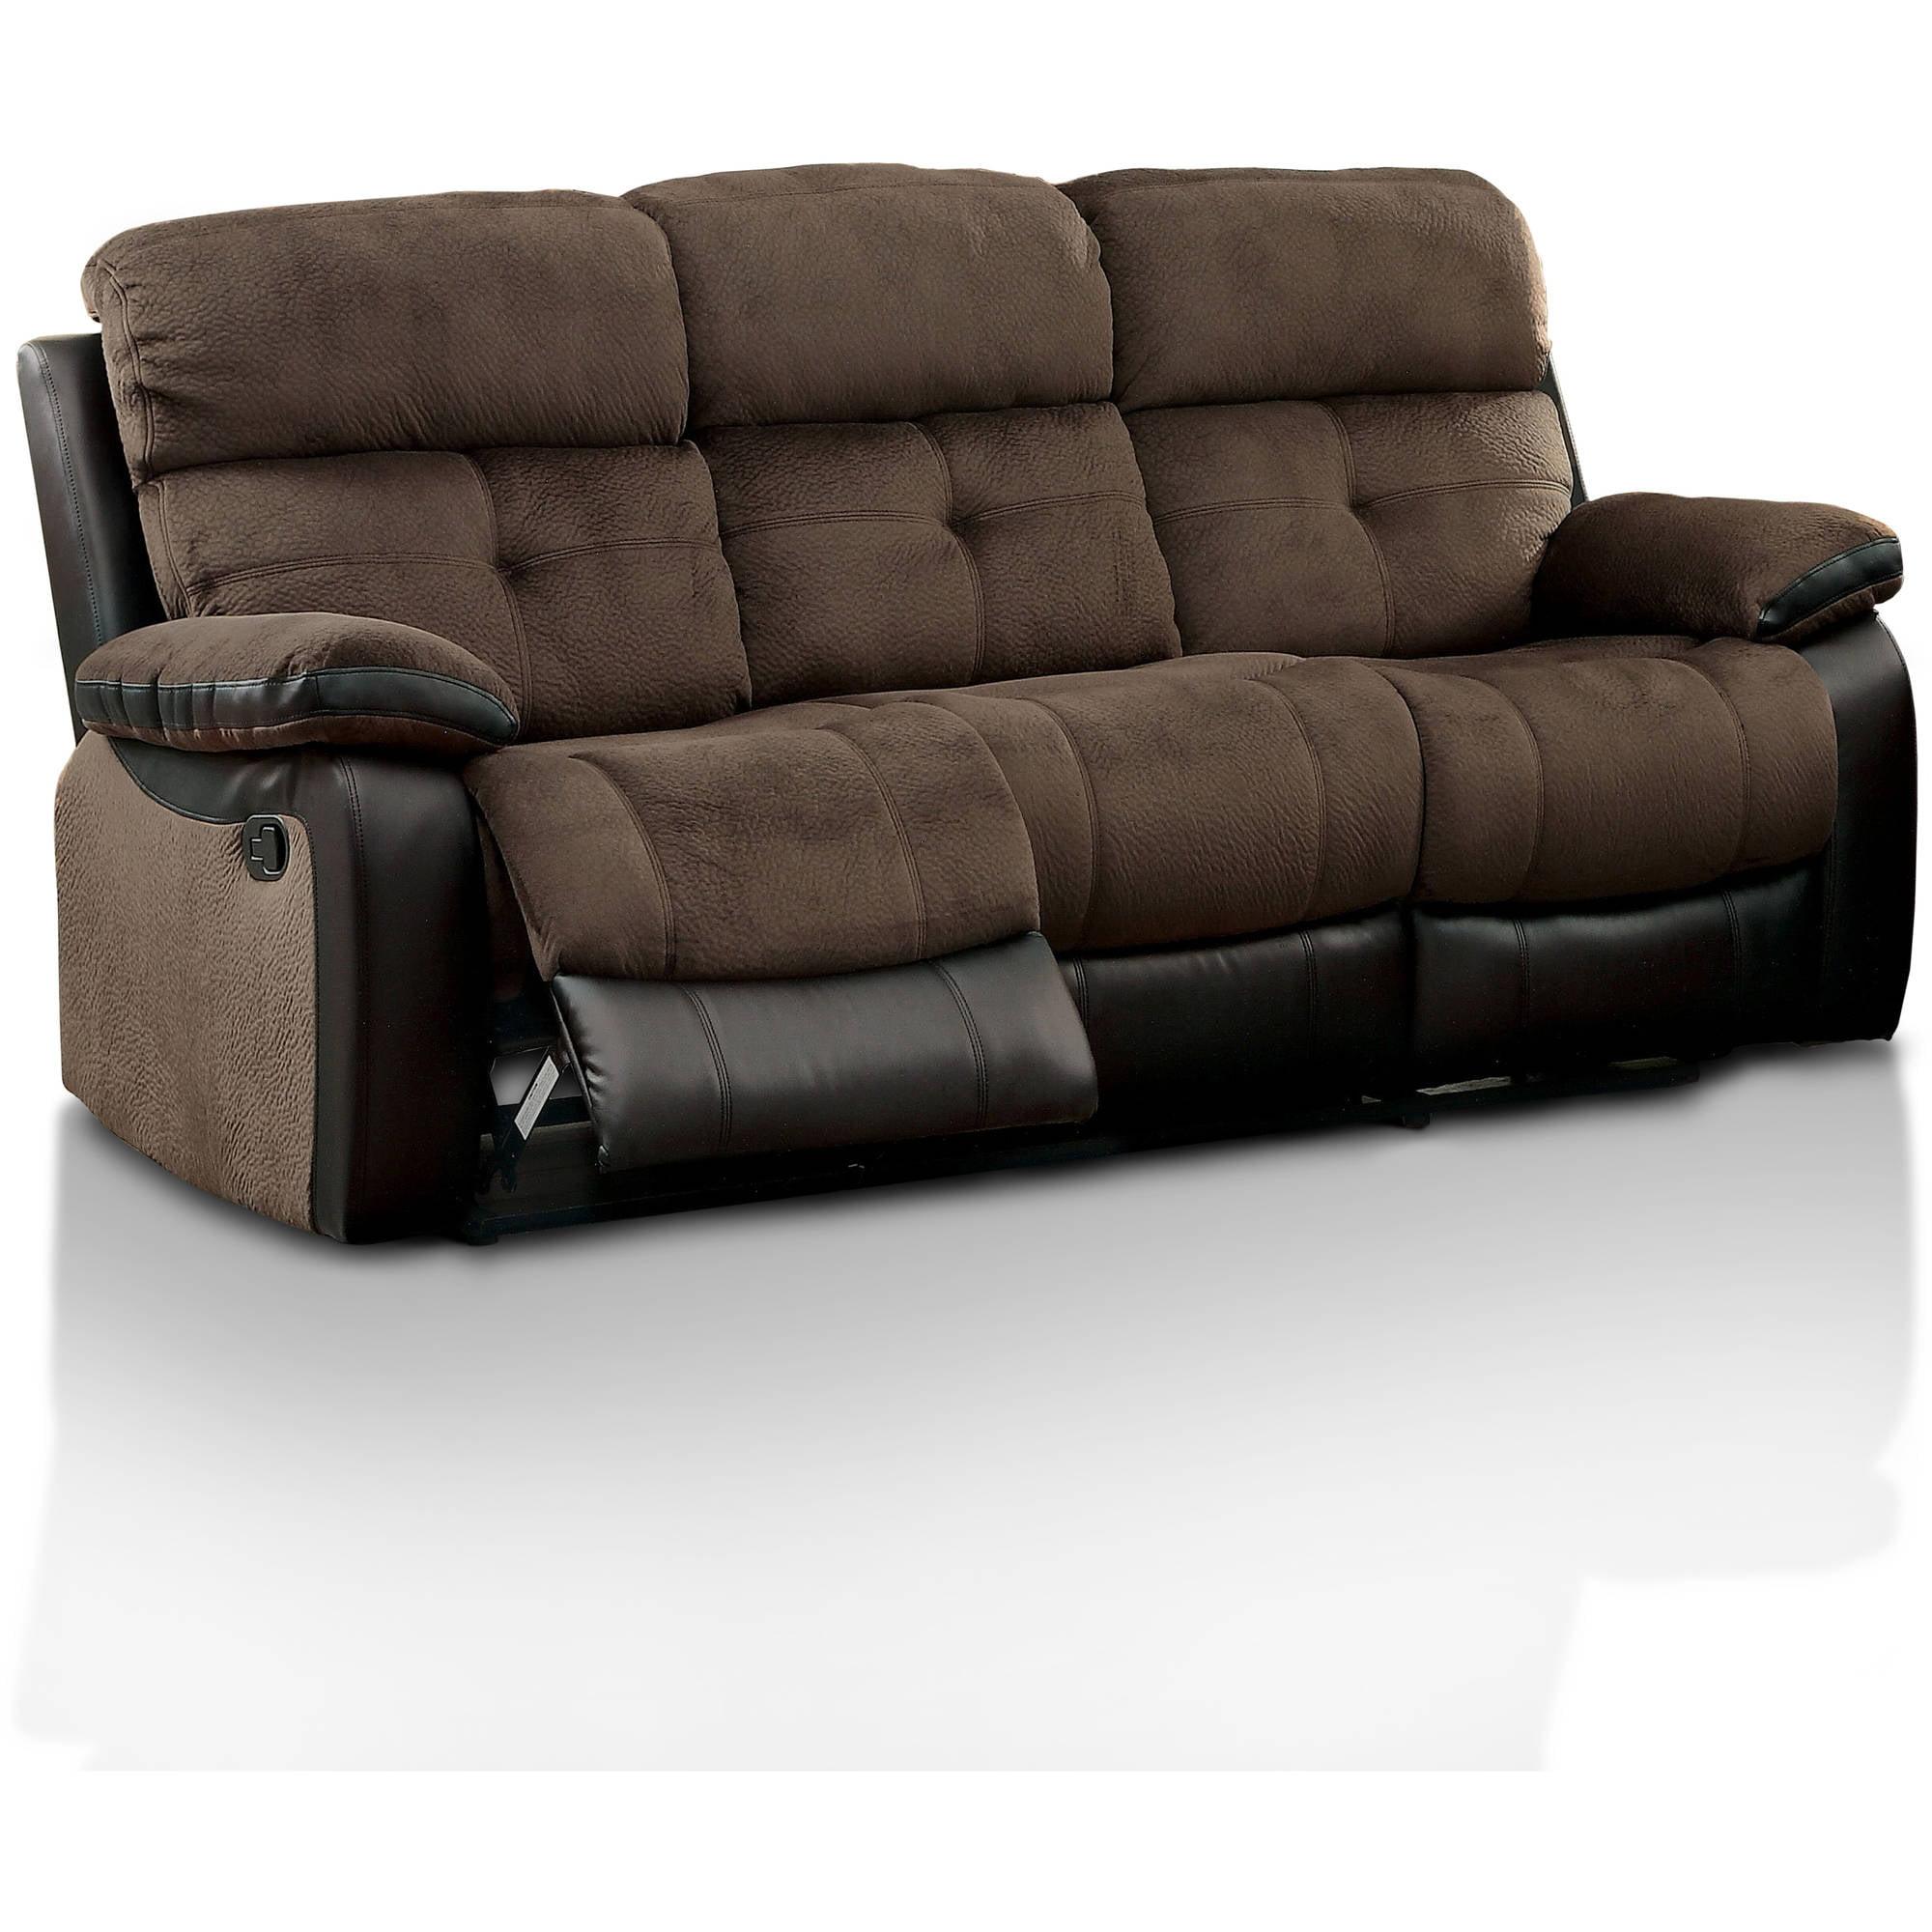 Furniture Of America Tristen Two Tone Reclining Sofa Brown Espresso